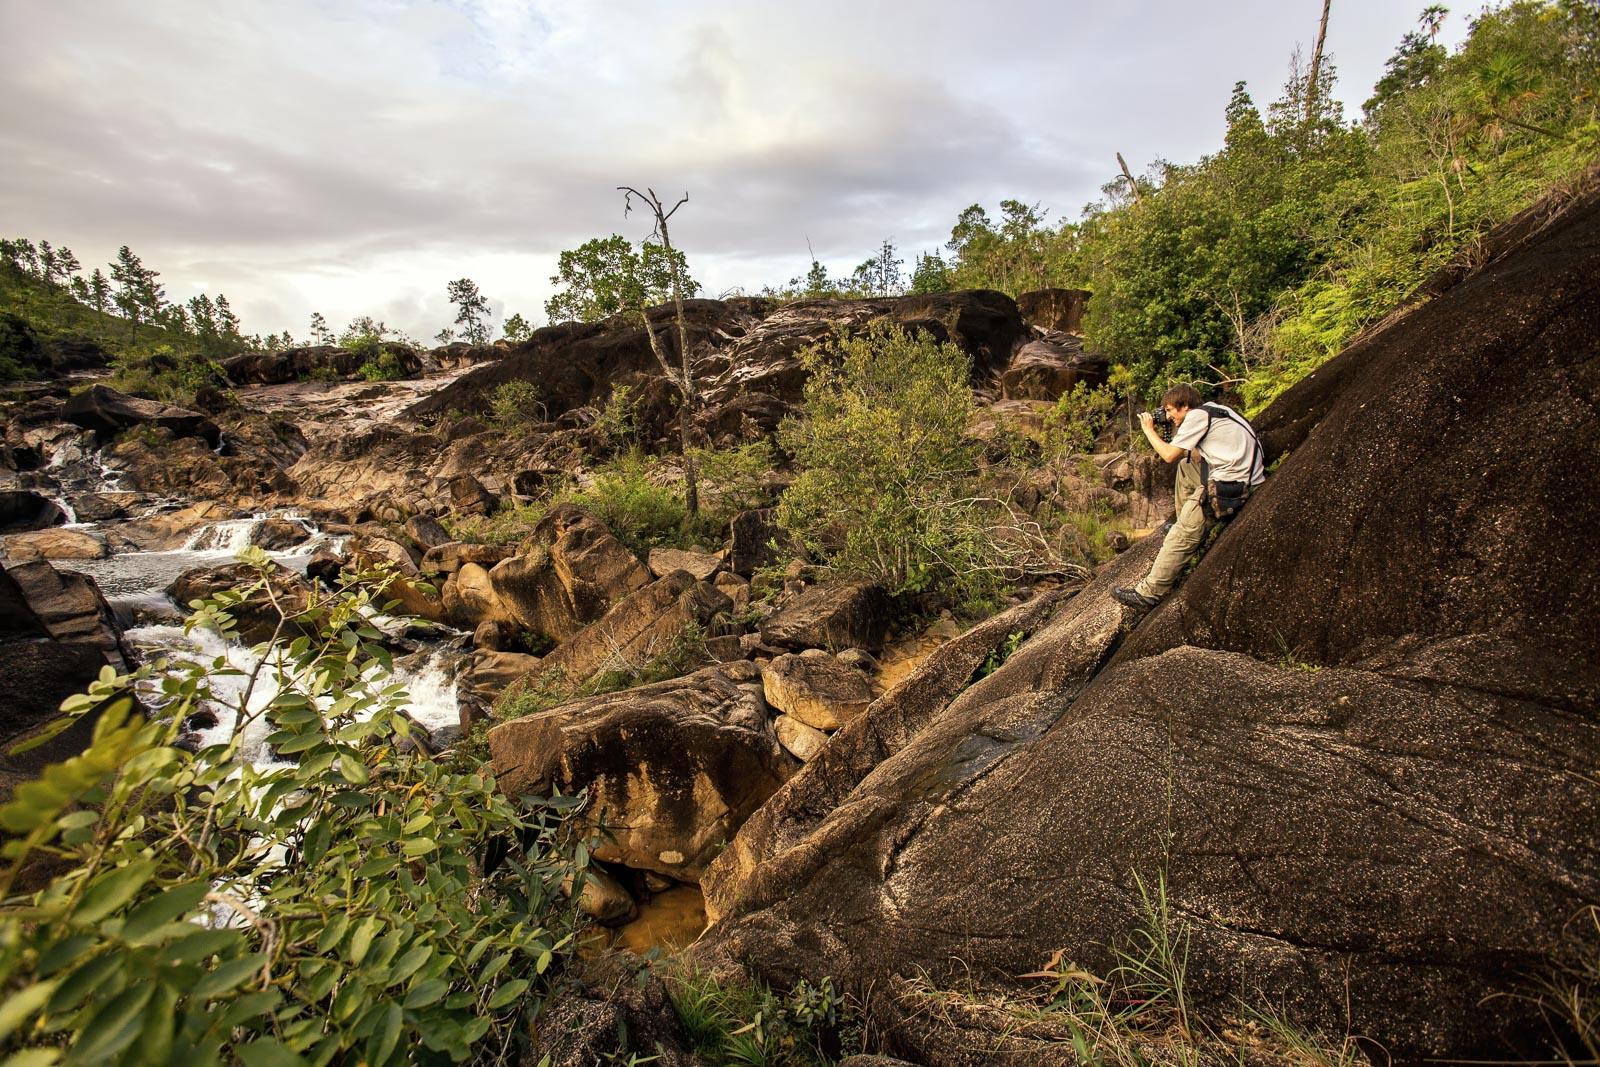 Pratt_Belize-Waterfall-Nature_01.jpg